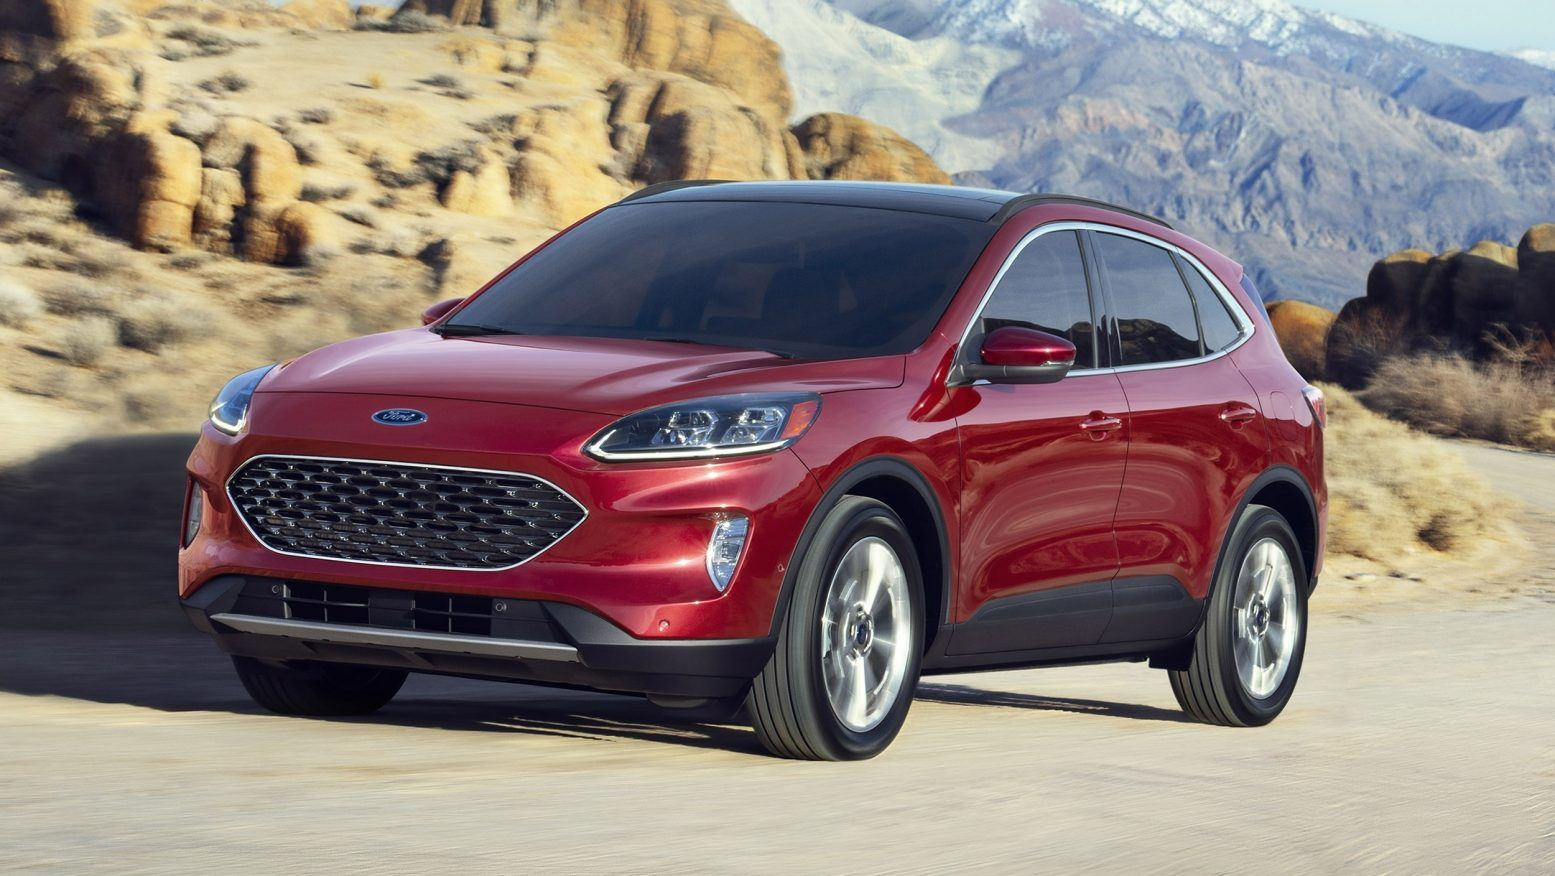 2020 Ford Escape Review Engine Release Price Platform Photos